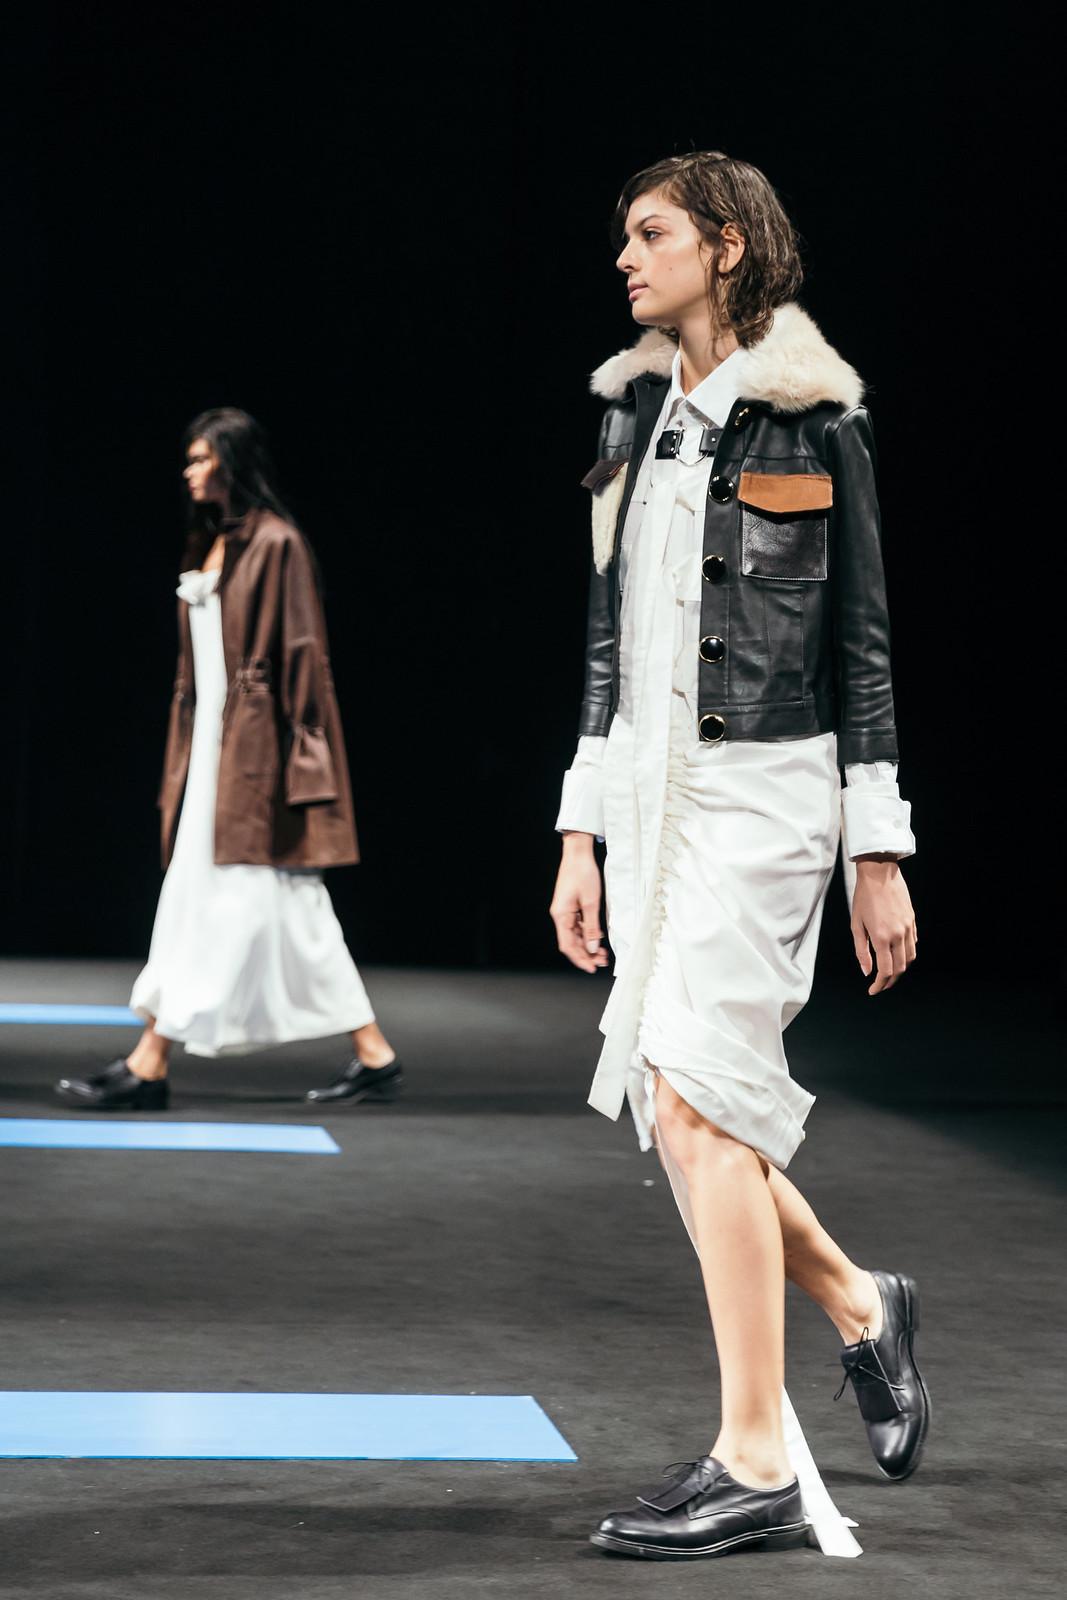 Jessie Chanes - Seams for a desire - 080 Bacelona Fashion #080bcnfasion -42